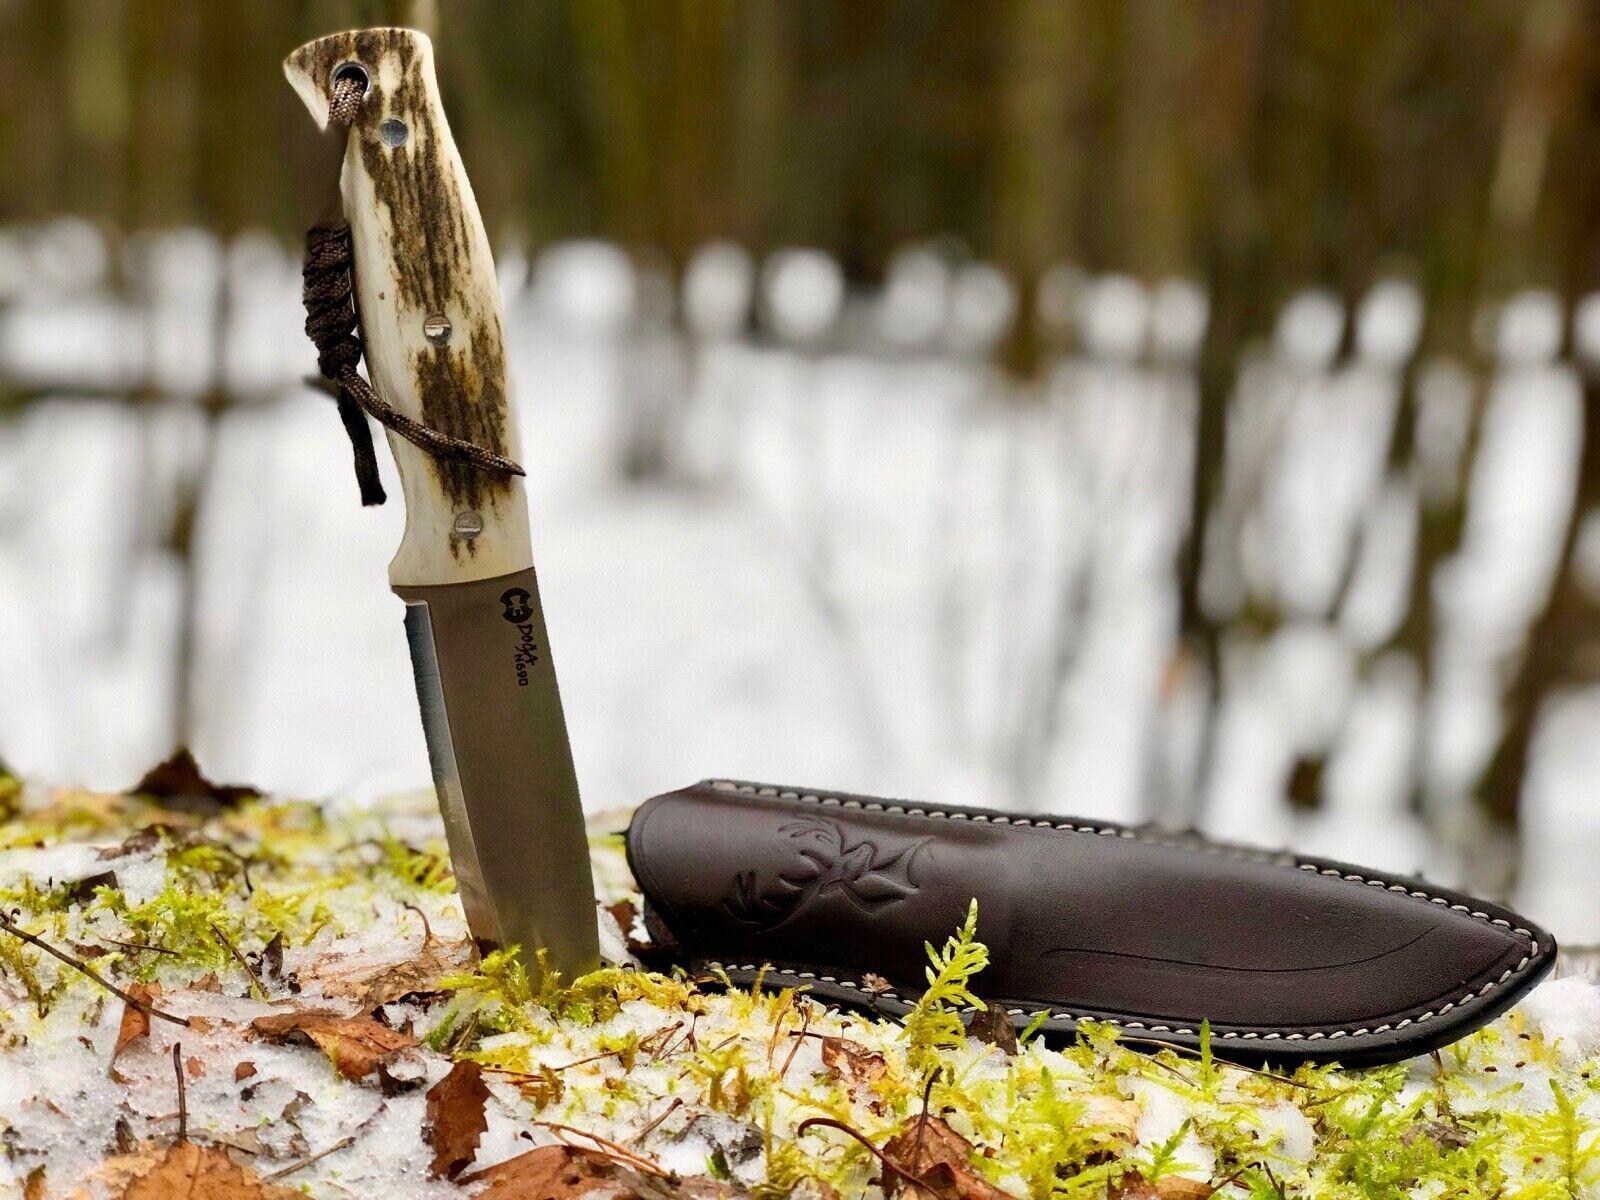 Knife Bushcraft Handmade 59 HRC n690 Böhler Deer Antler Leather Sheath